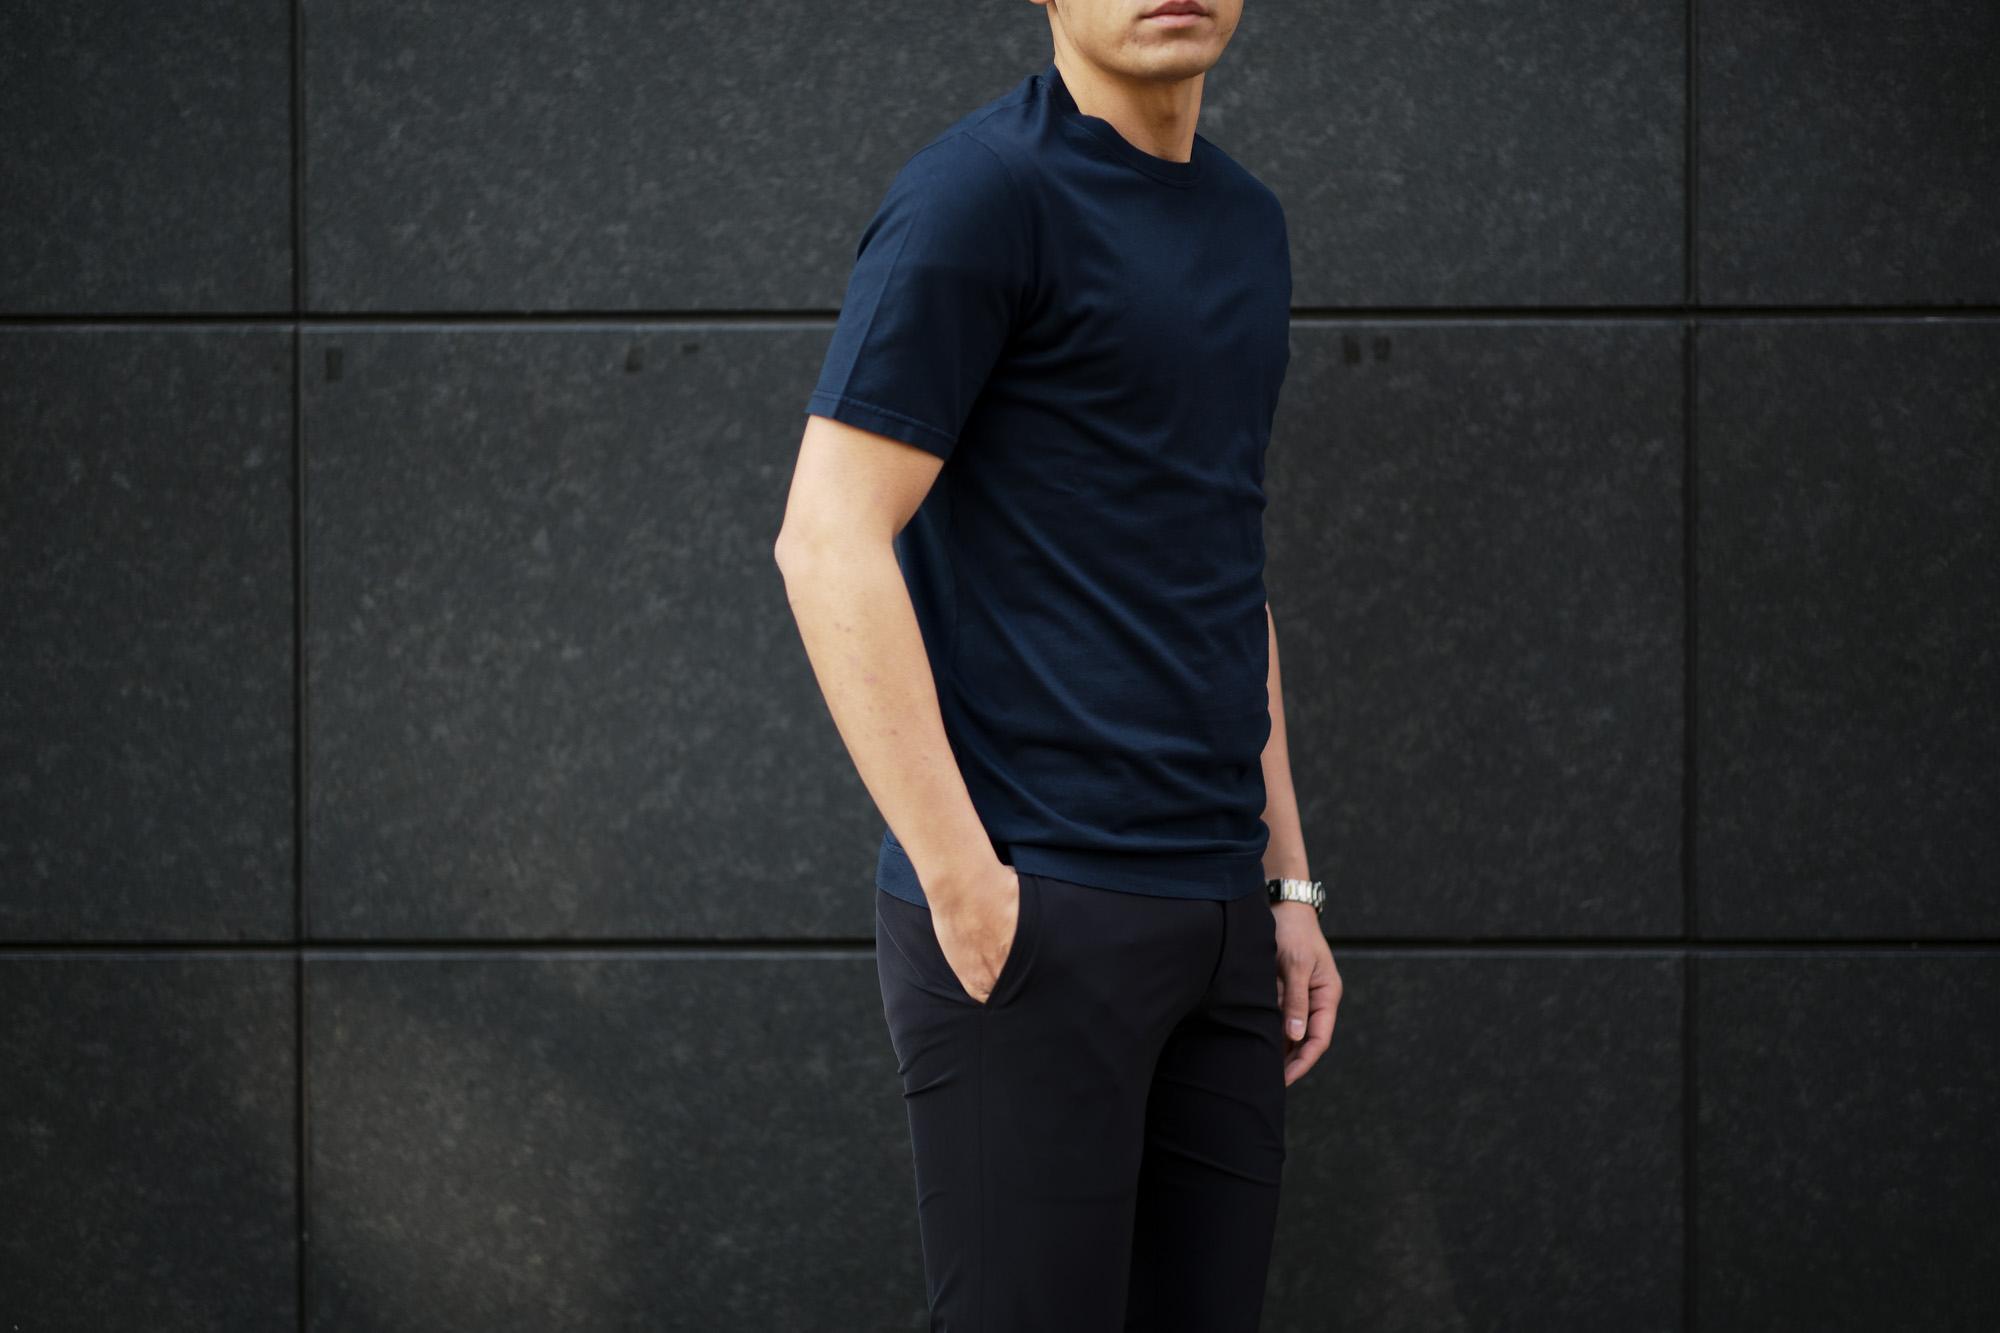 FEDELI(フェデーリ) Crew Neck T-shirt (クルーネック Tシャツ) ギザコットン Tシャツ NAVY (ネイビー・626) made in italy (イタリア製) 2020 春夏新作 愛知 名古屋 altoediritto アルトエデリット TEE